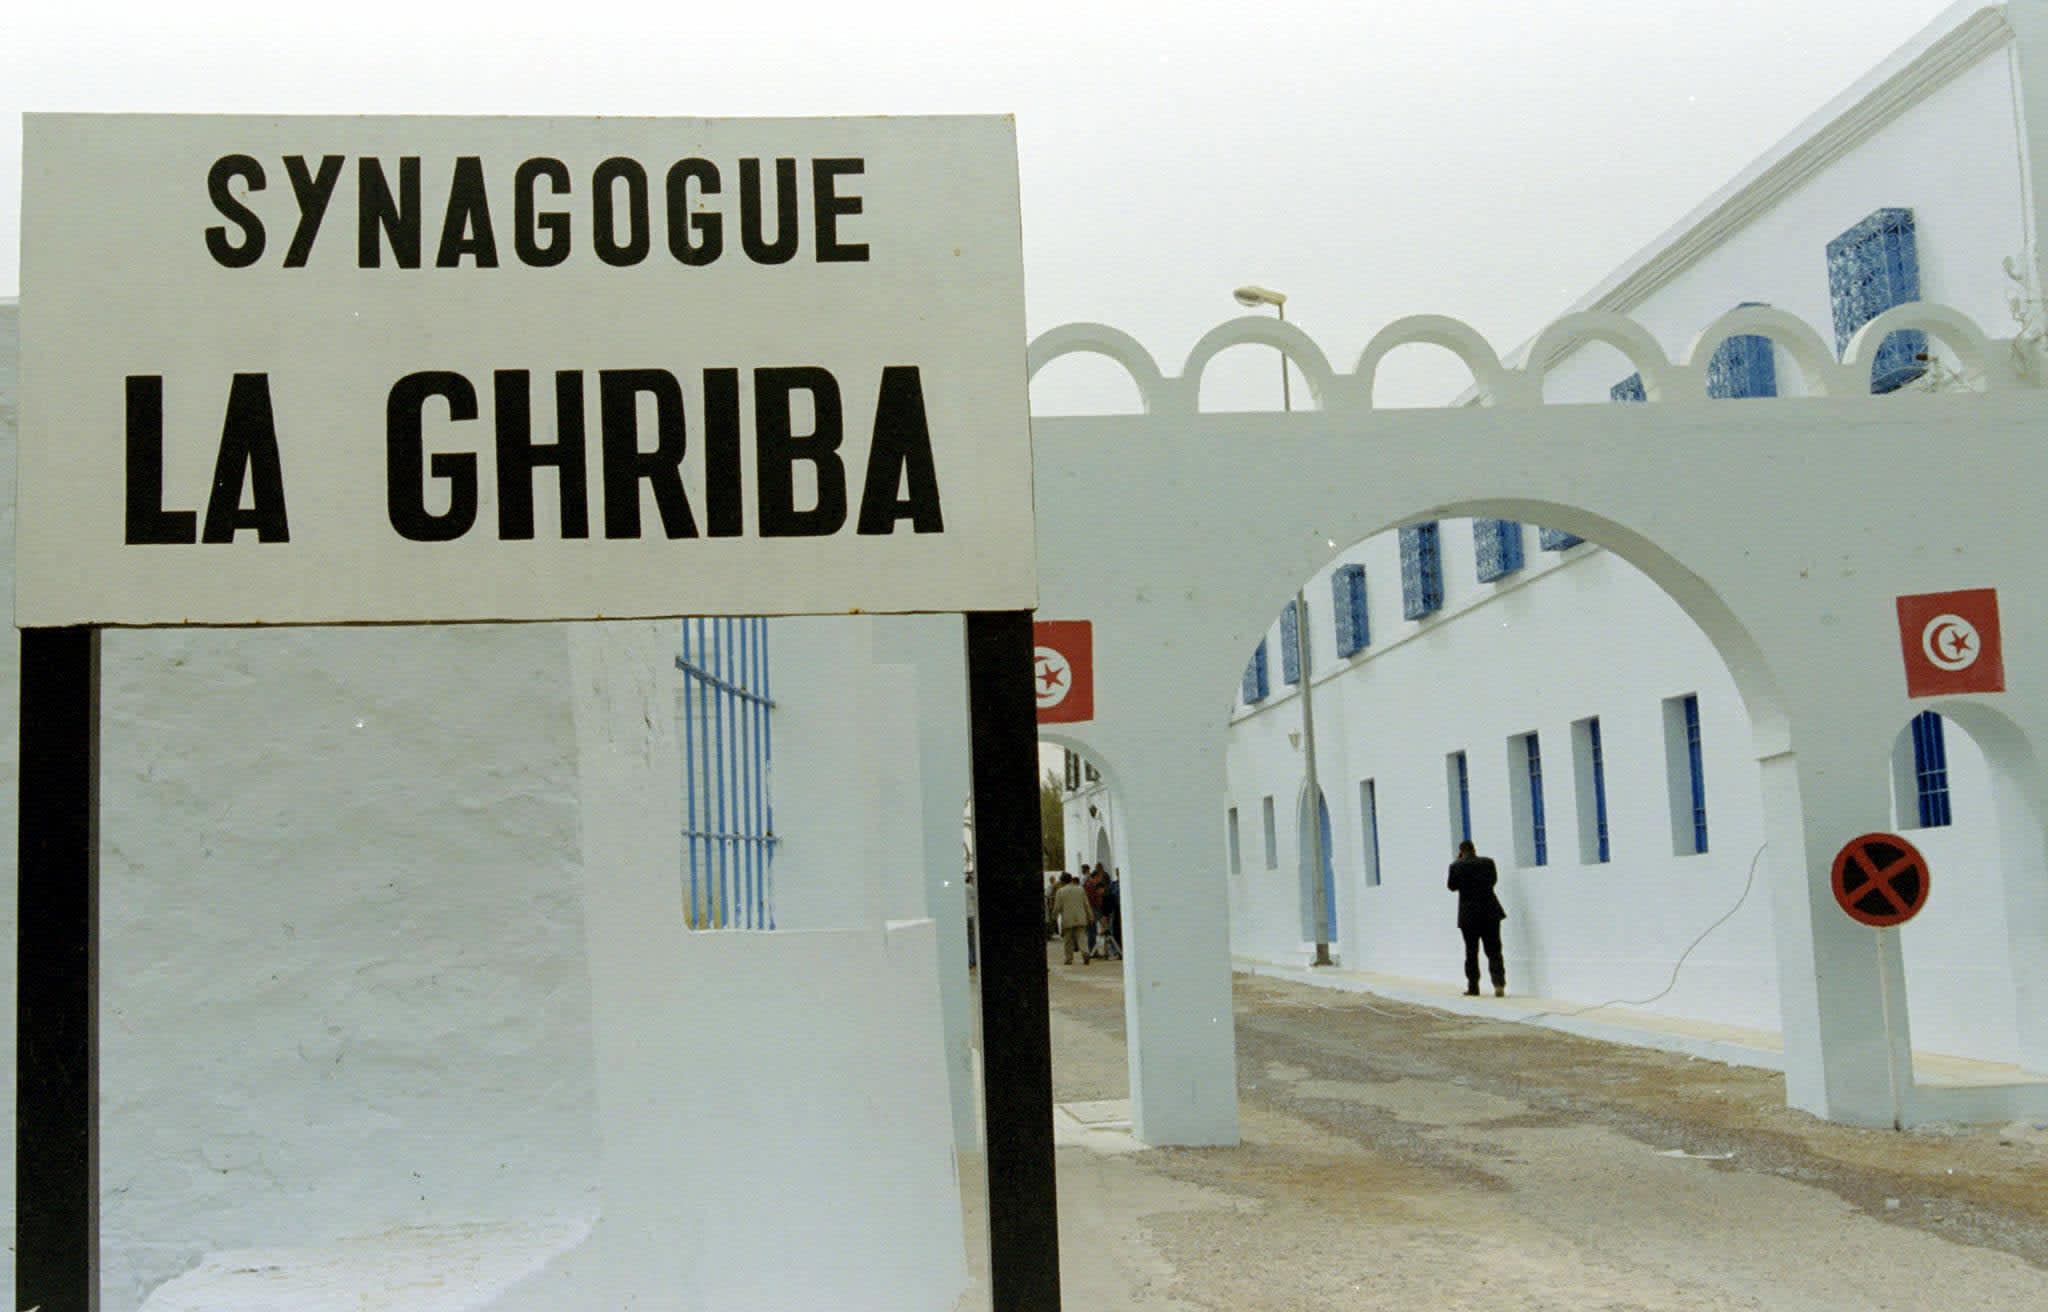 Exterior view of the Jewish Shrine El Ghriba (MOHAMED HAMMI / REUTERS)